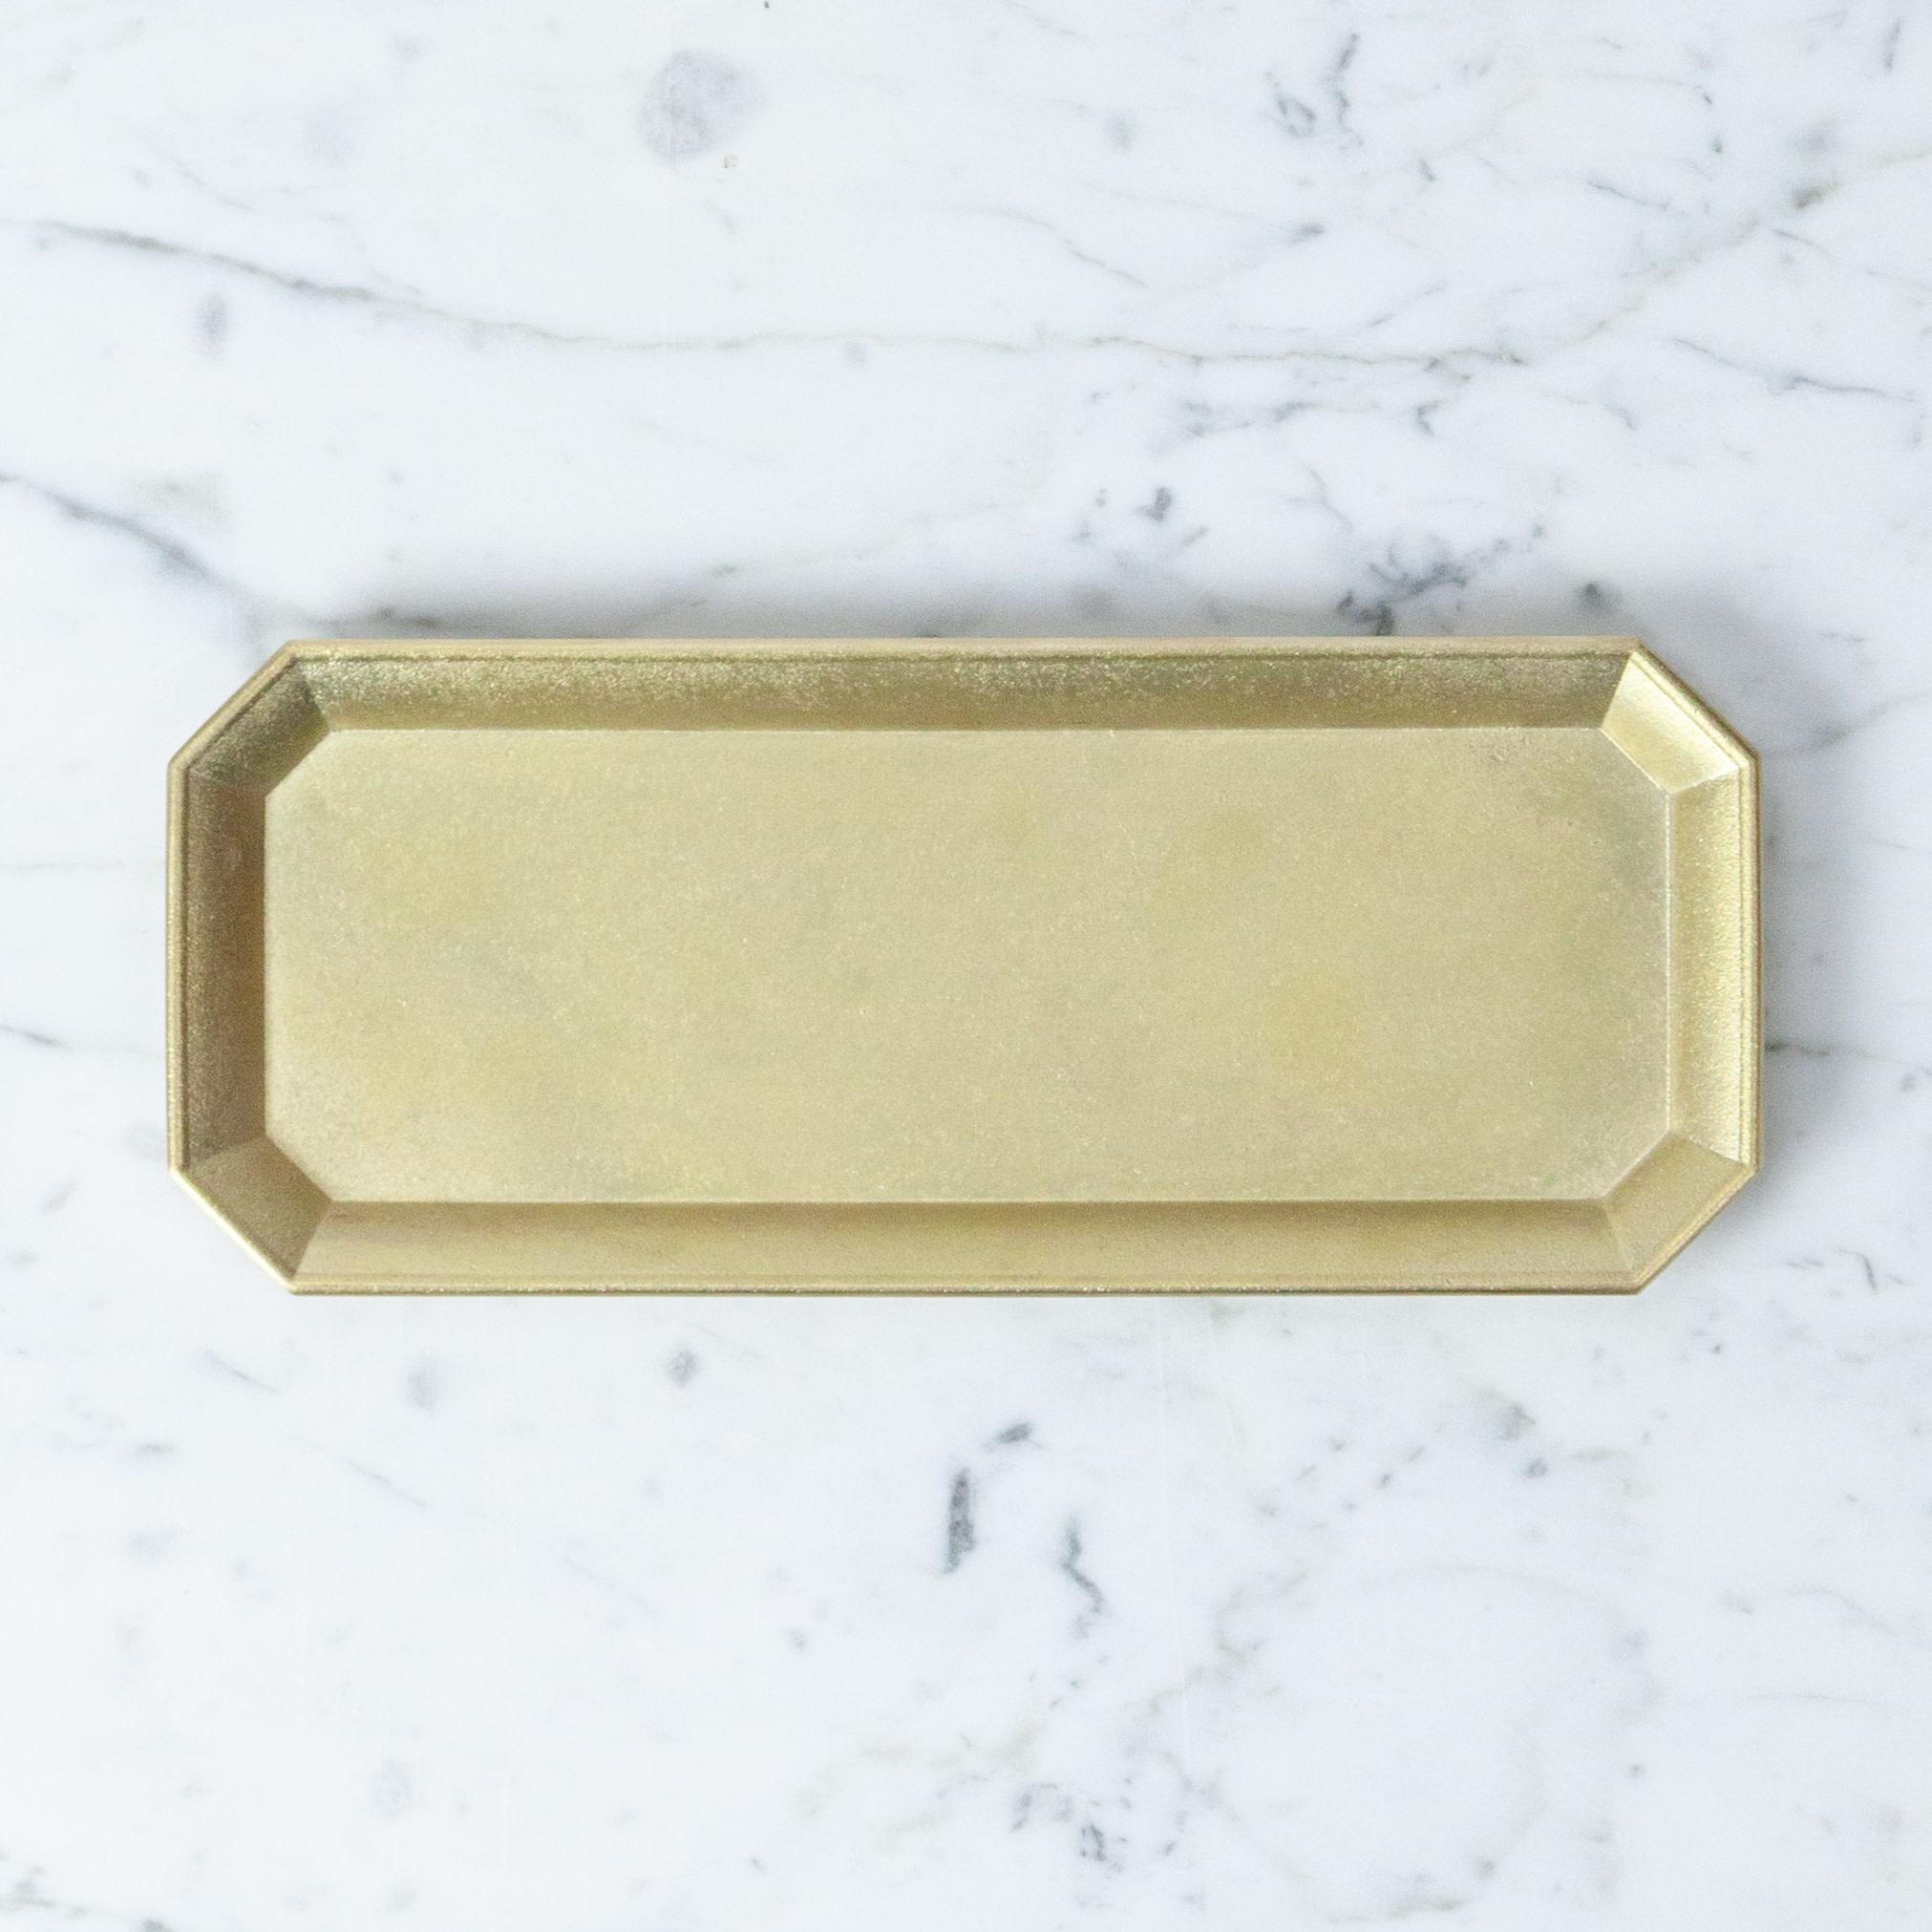 "FUTAGAMI Futagami Brass Stationery Tray - Large - 8.25"""